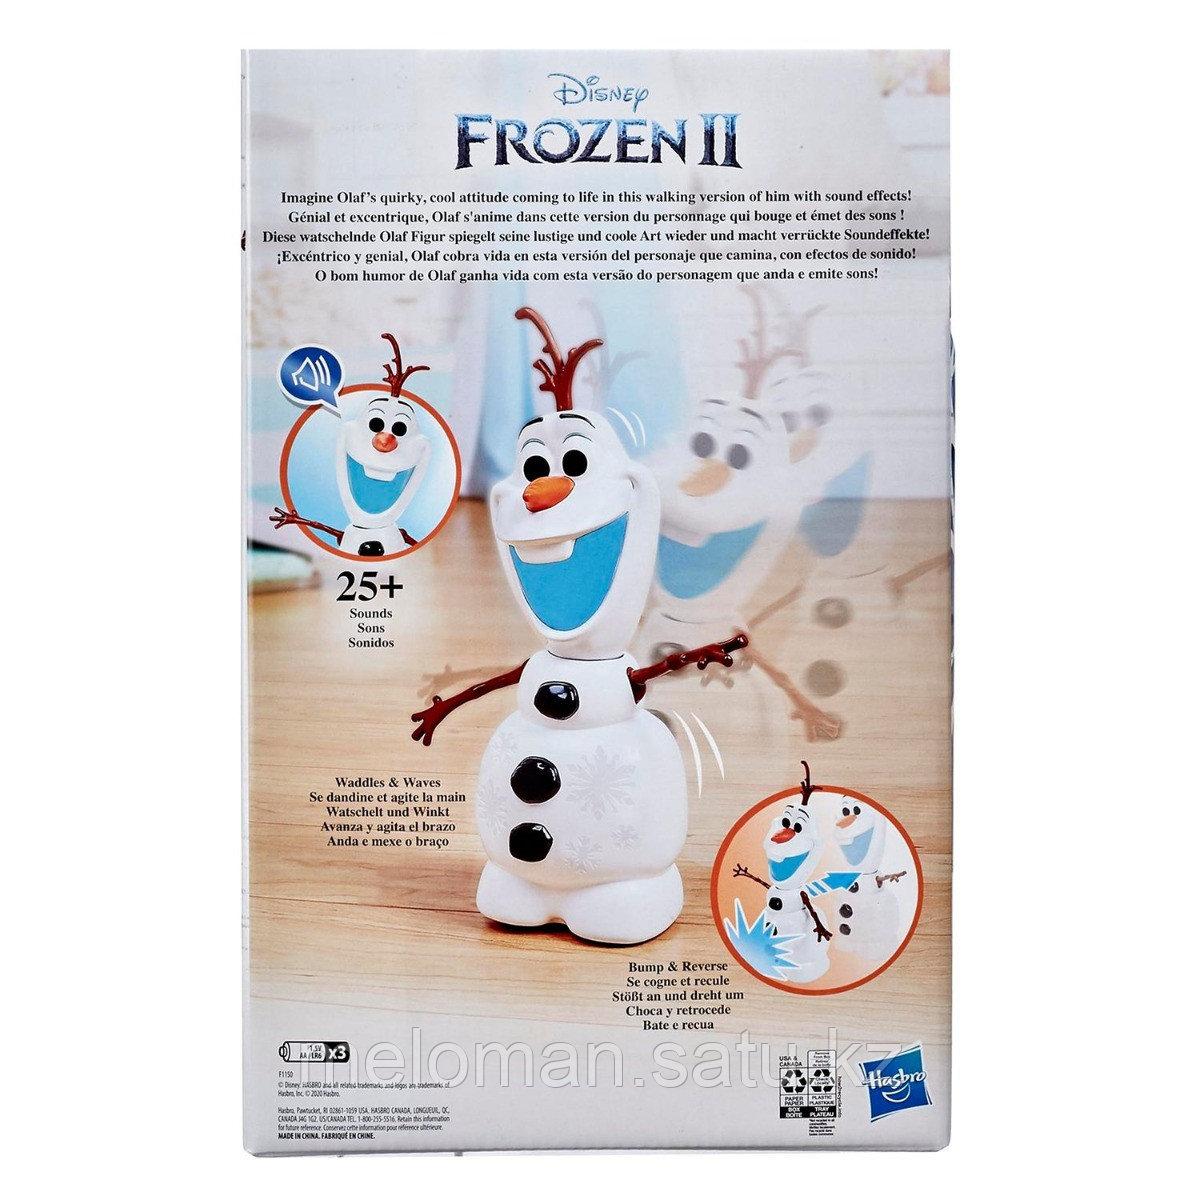 Disney Frozen: ИГРУШКА ХОЛОД СЕРД2 ИНТЕРАКТИВНЫЙ ОЛАФ - фото 5